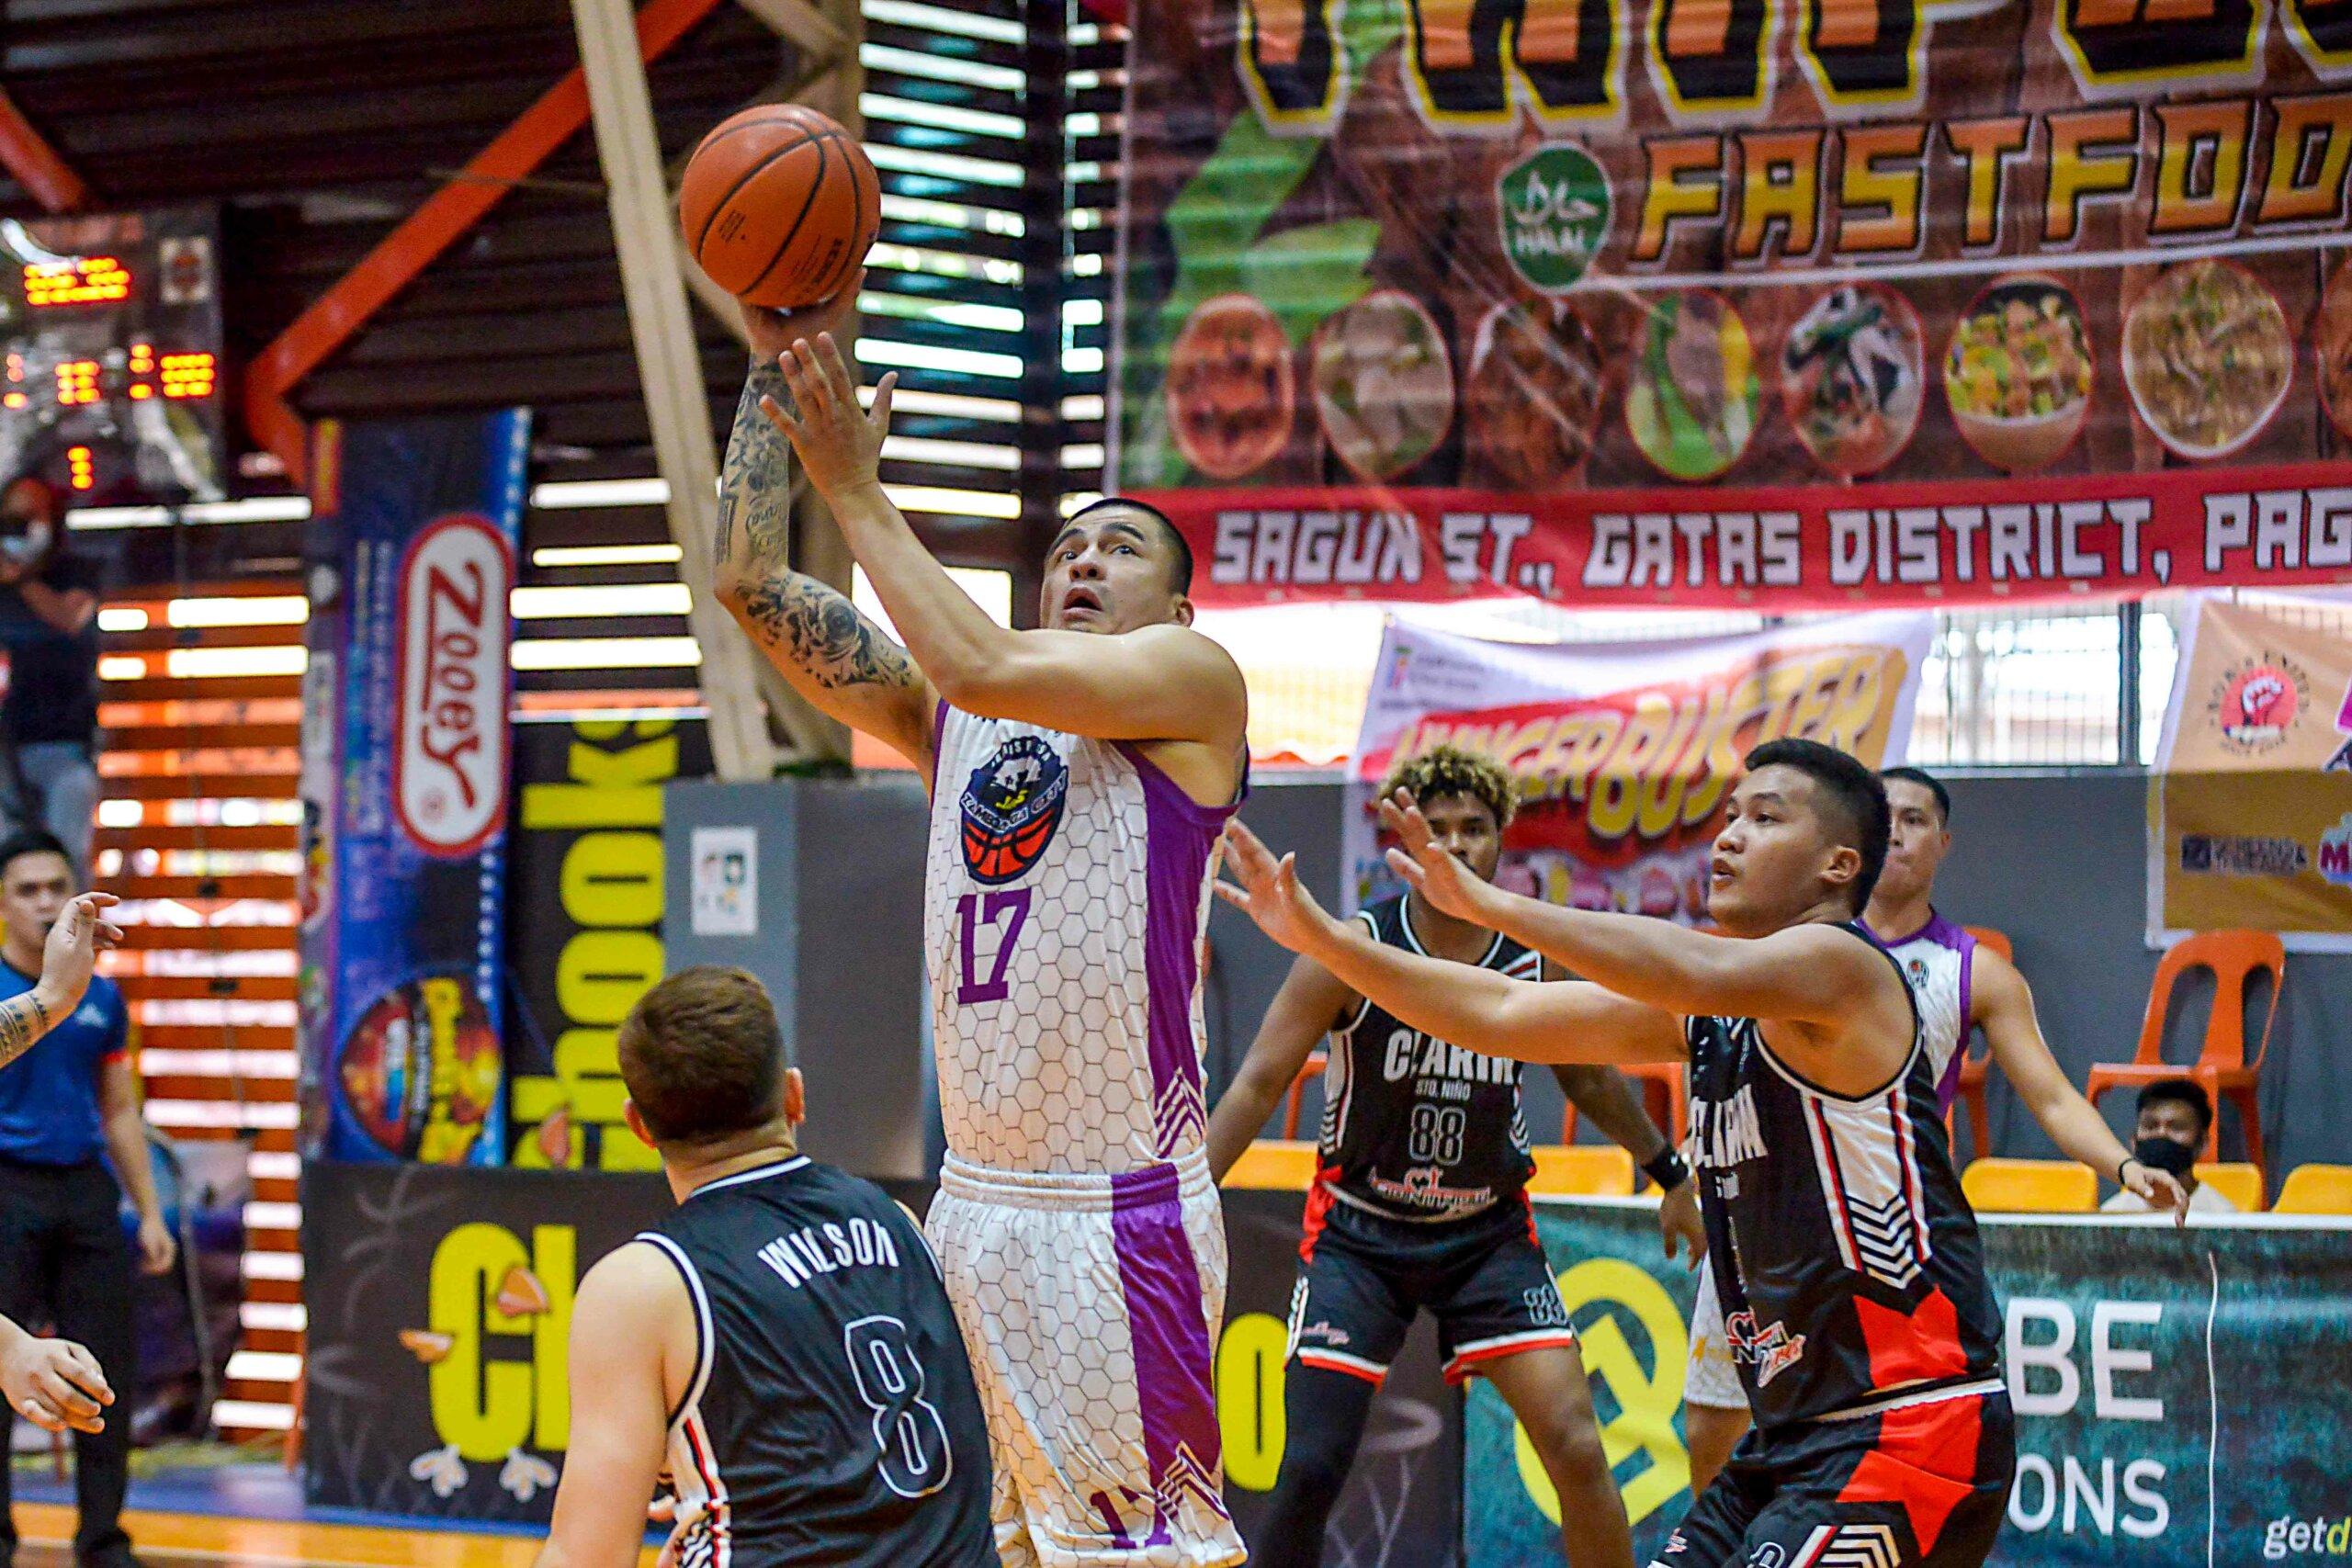 2021-Chooks-VisMin-Mindanao-SF-1-Zamboanga-City-vs-Clarin-Mac-Cardona-scaled Yu coming of age as Cardona defies it for JPS Zamboanga Basketball News VisMin Super Cup  - philippine sports news